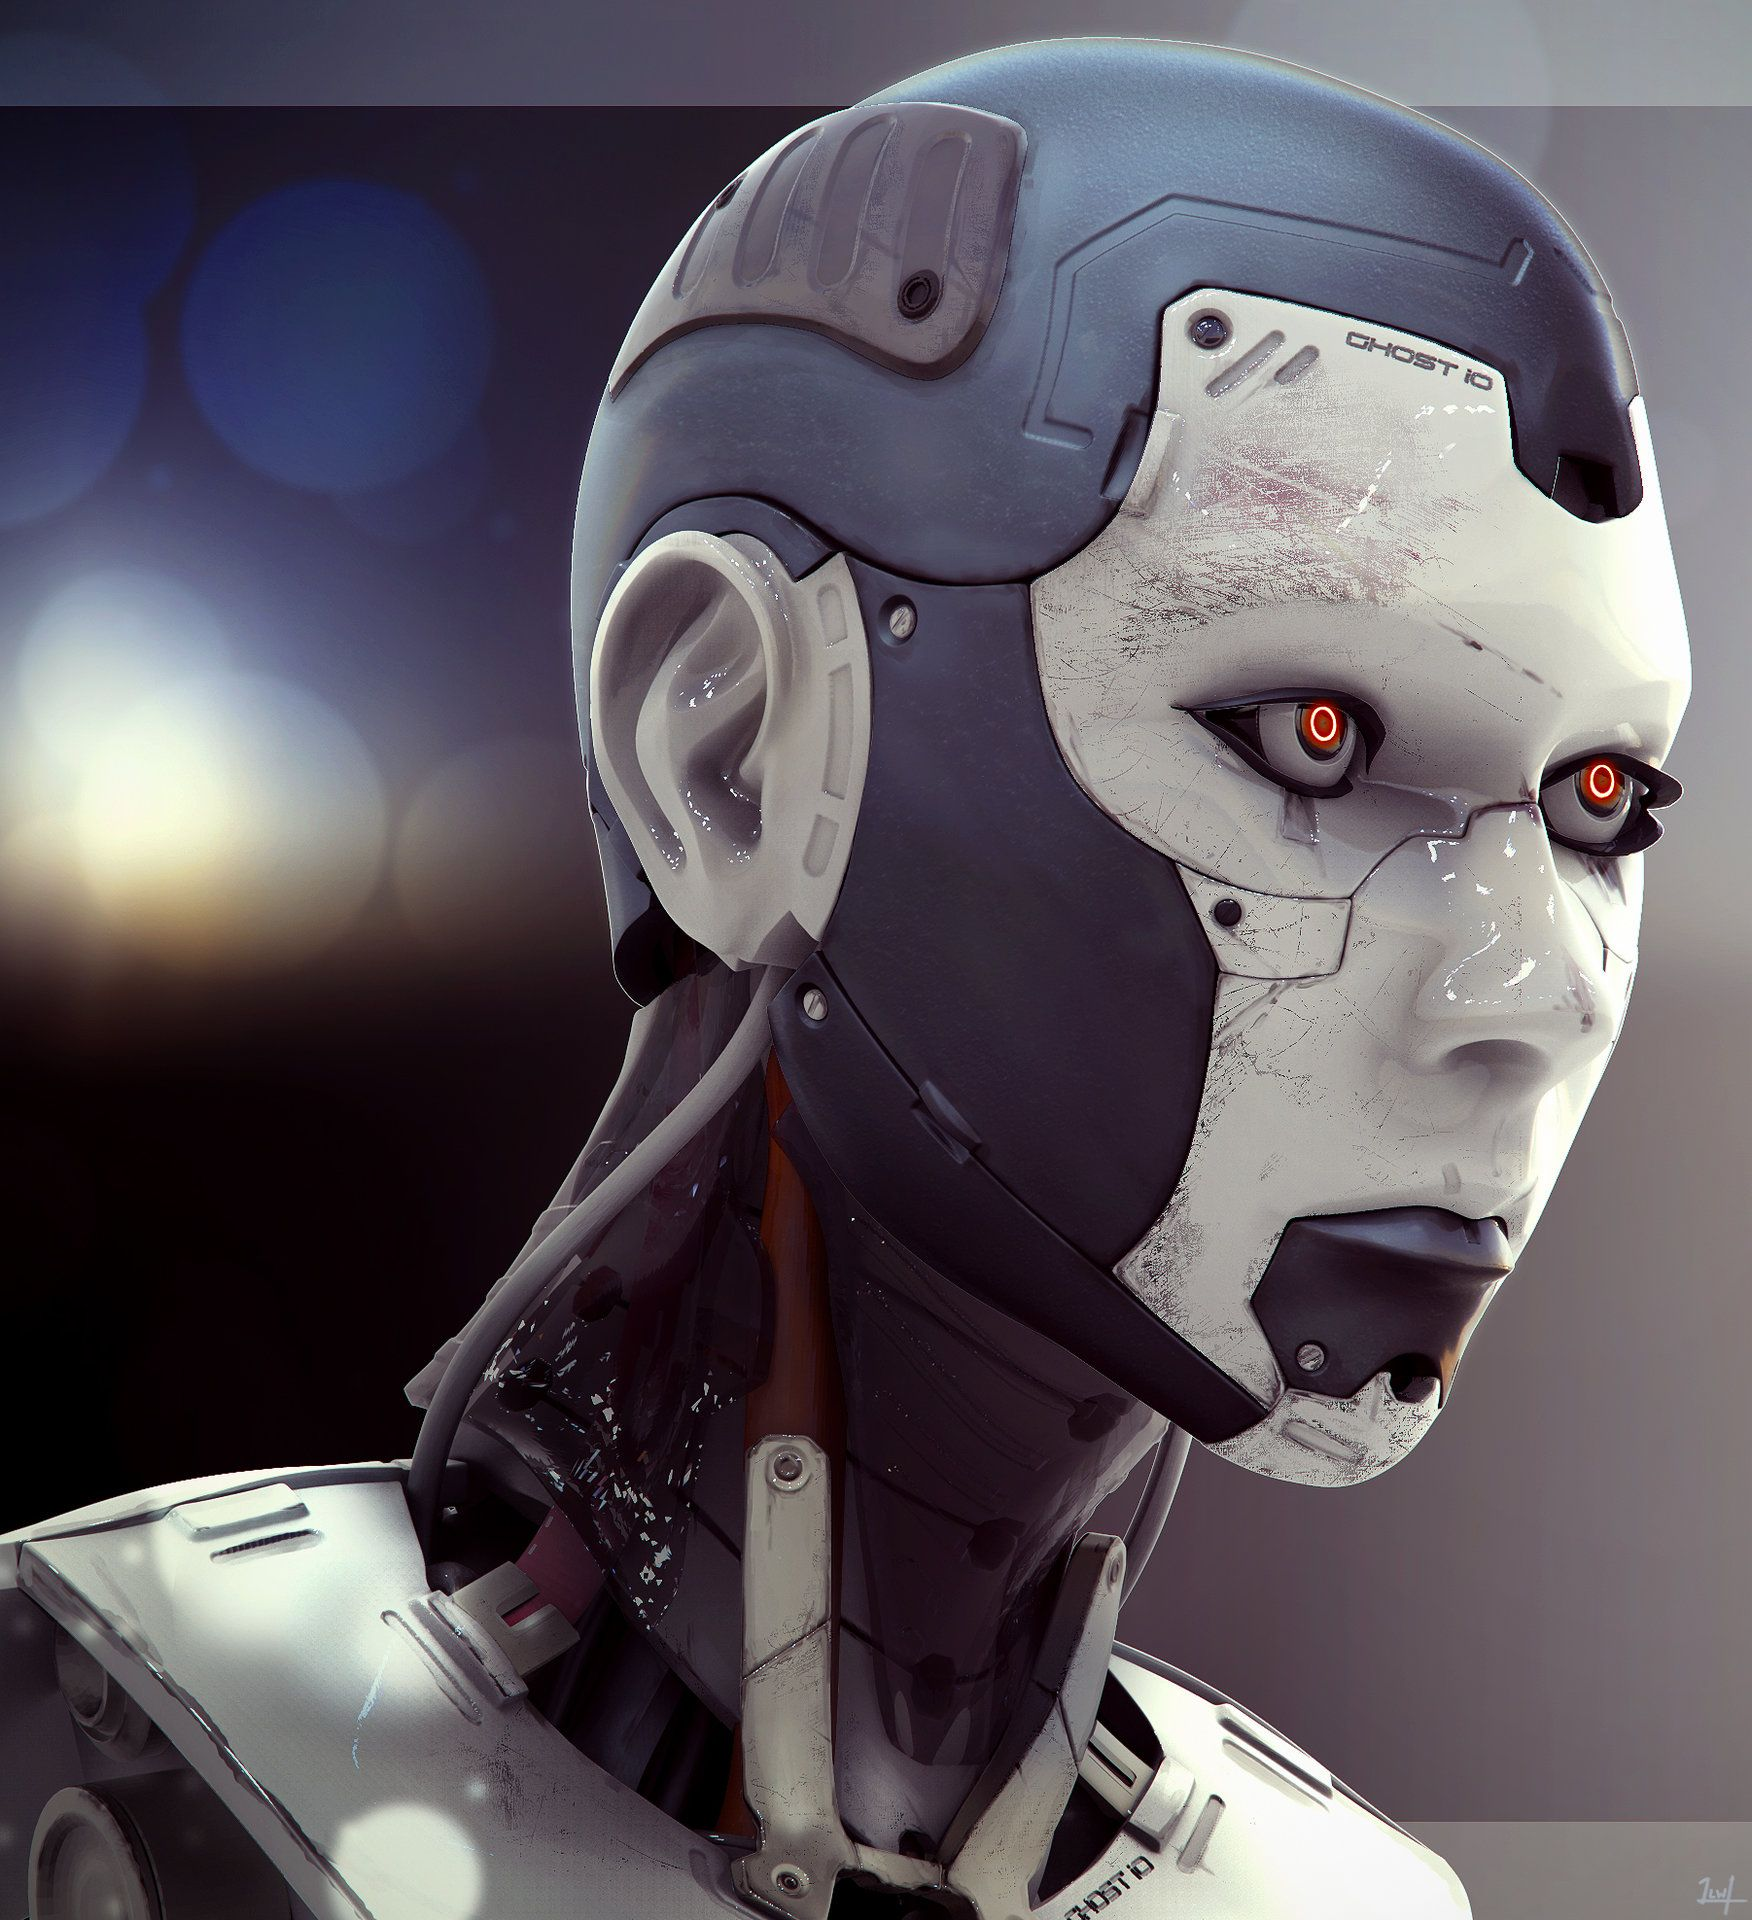 ArtStation - Cyborg, Lance Wilkinson